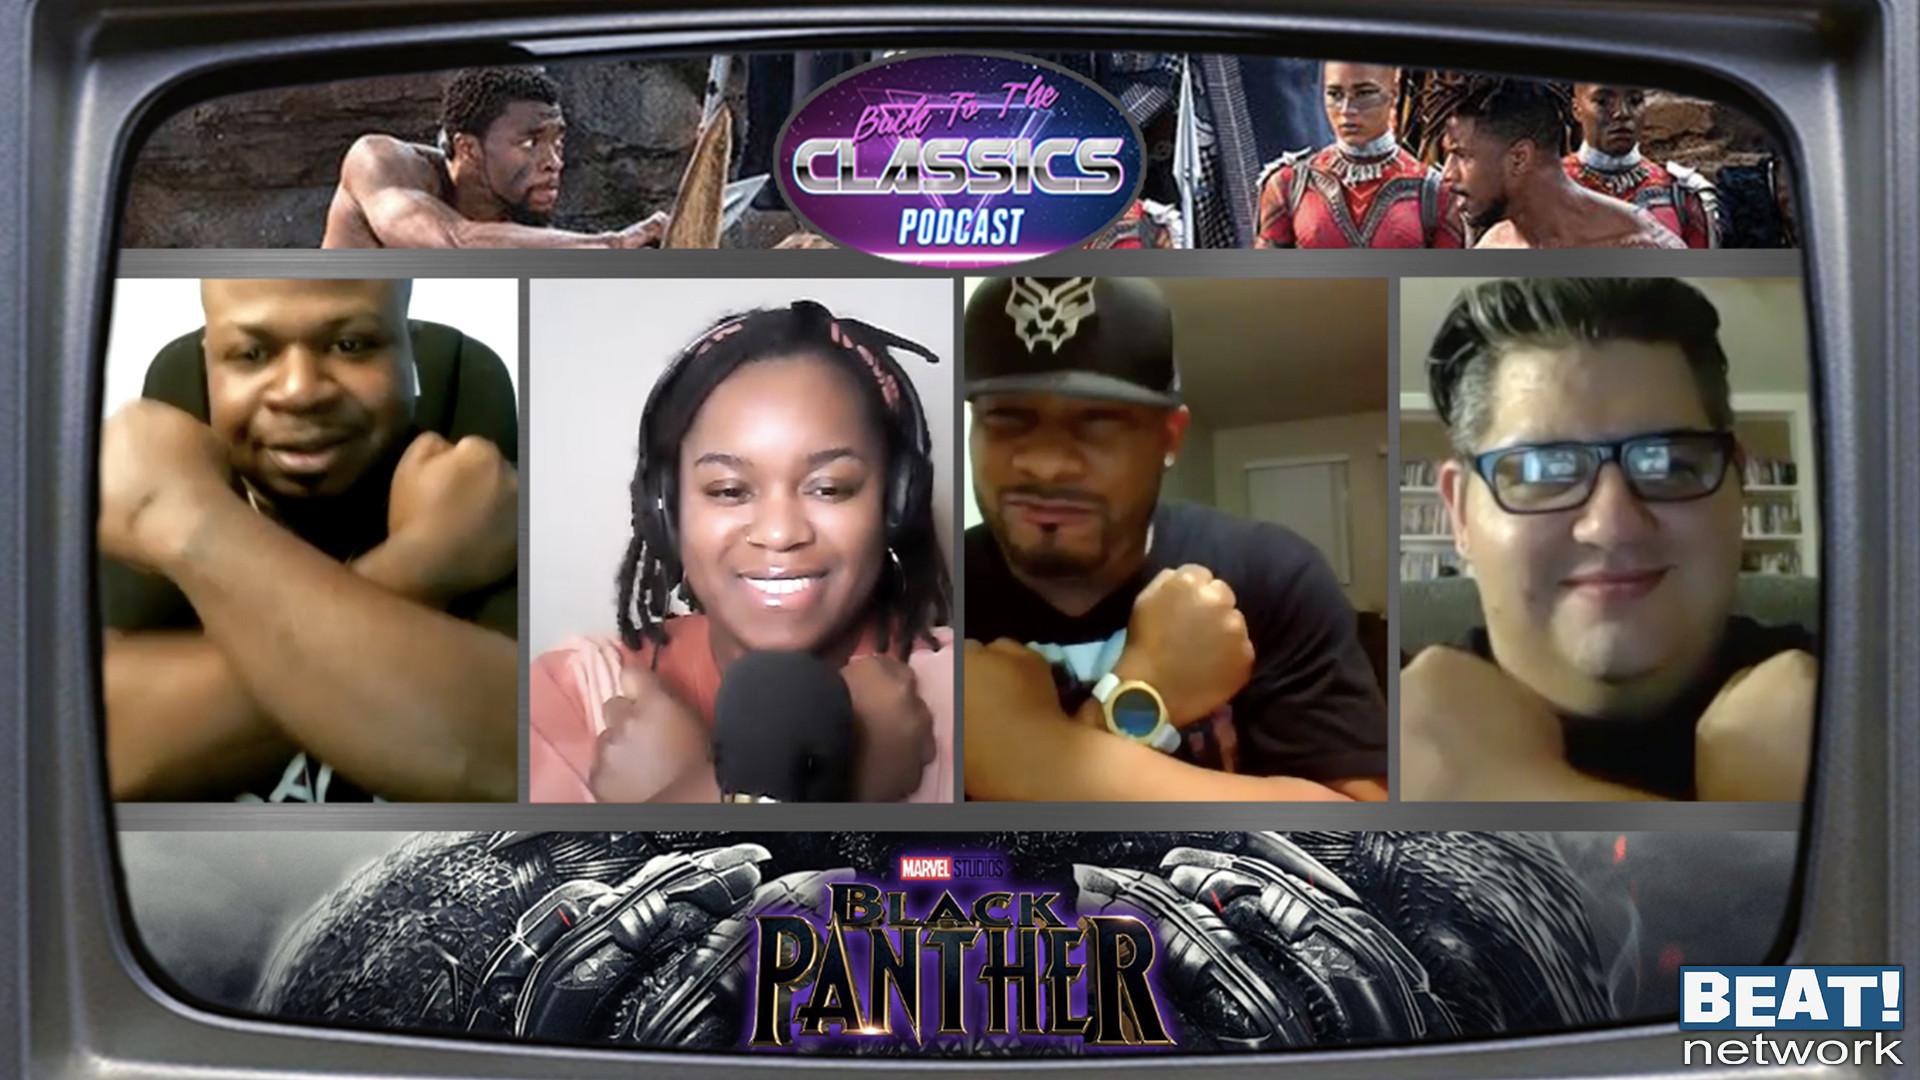 Back to Black Panther w/ Rach Da Gem